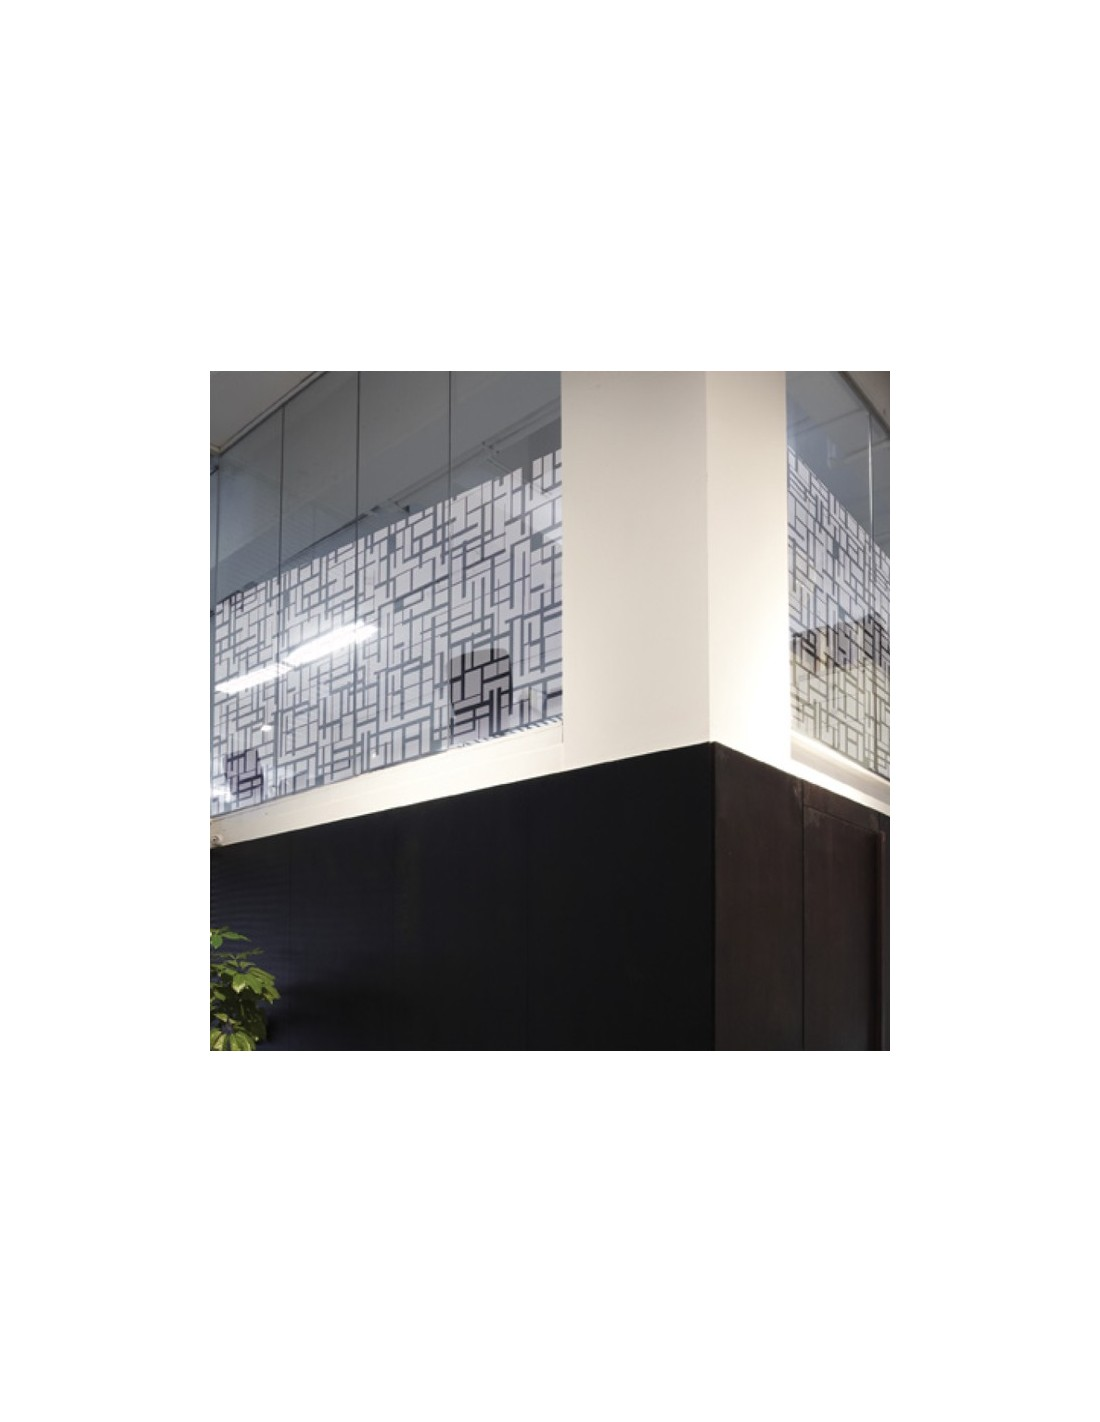 film adh sif d co style architectural film d poli design. Black Bedroom Furniture Sets. Home Design Ideas